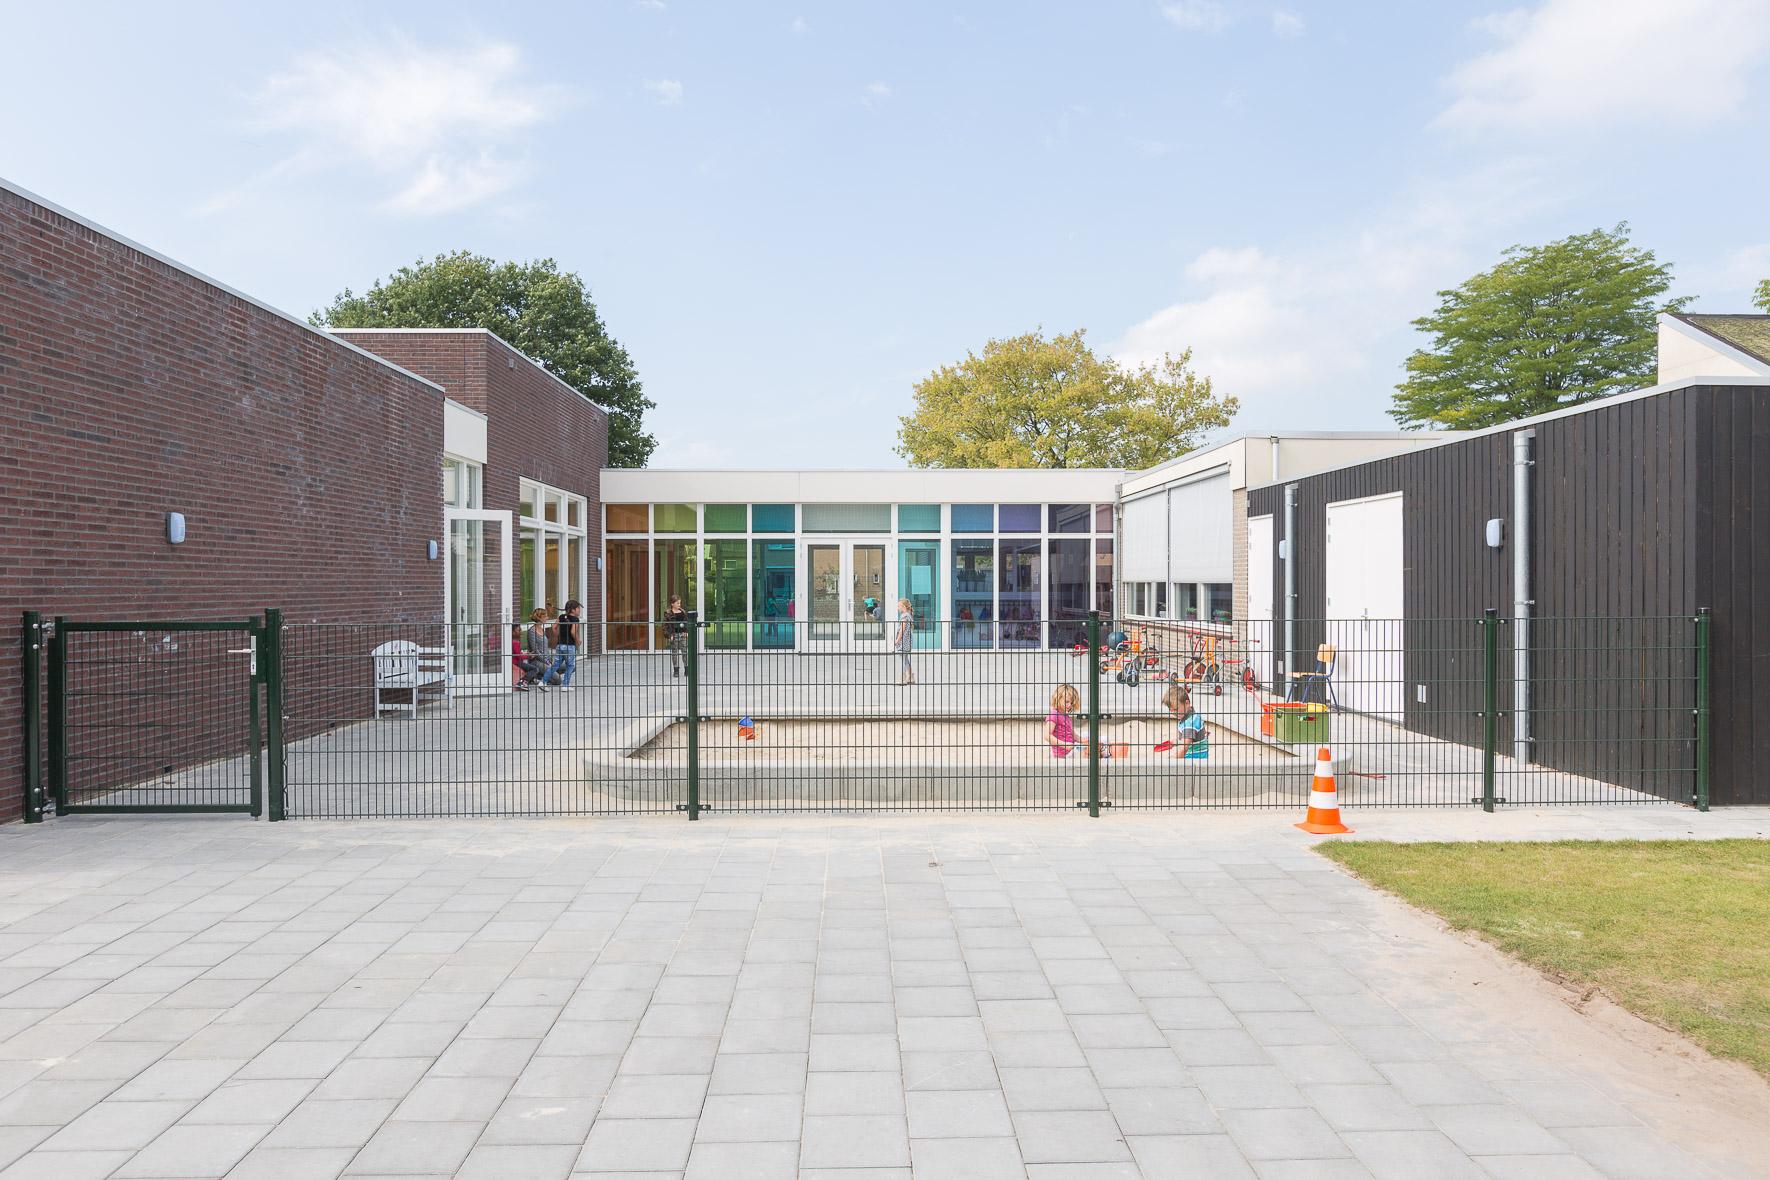 Kindercentrum bloemenoord marquart architecten b v for Dat architecten